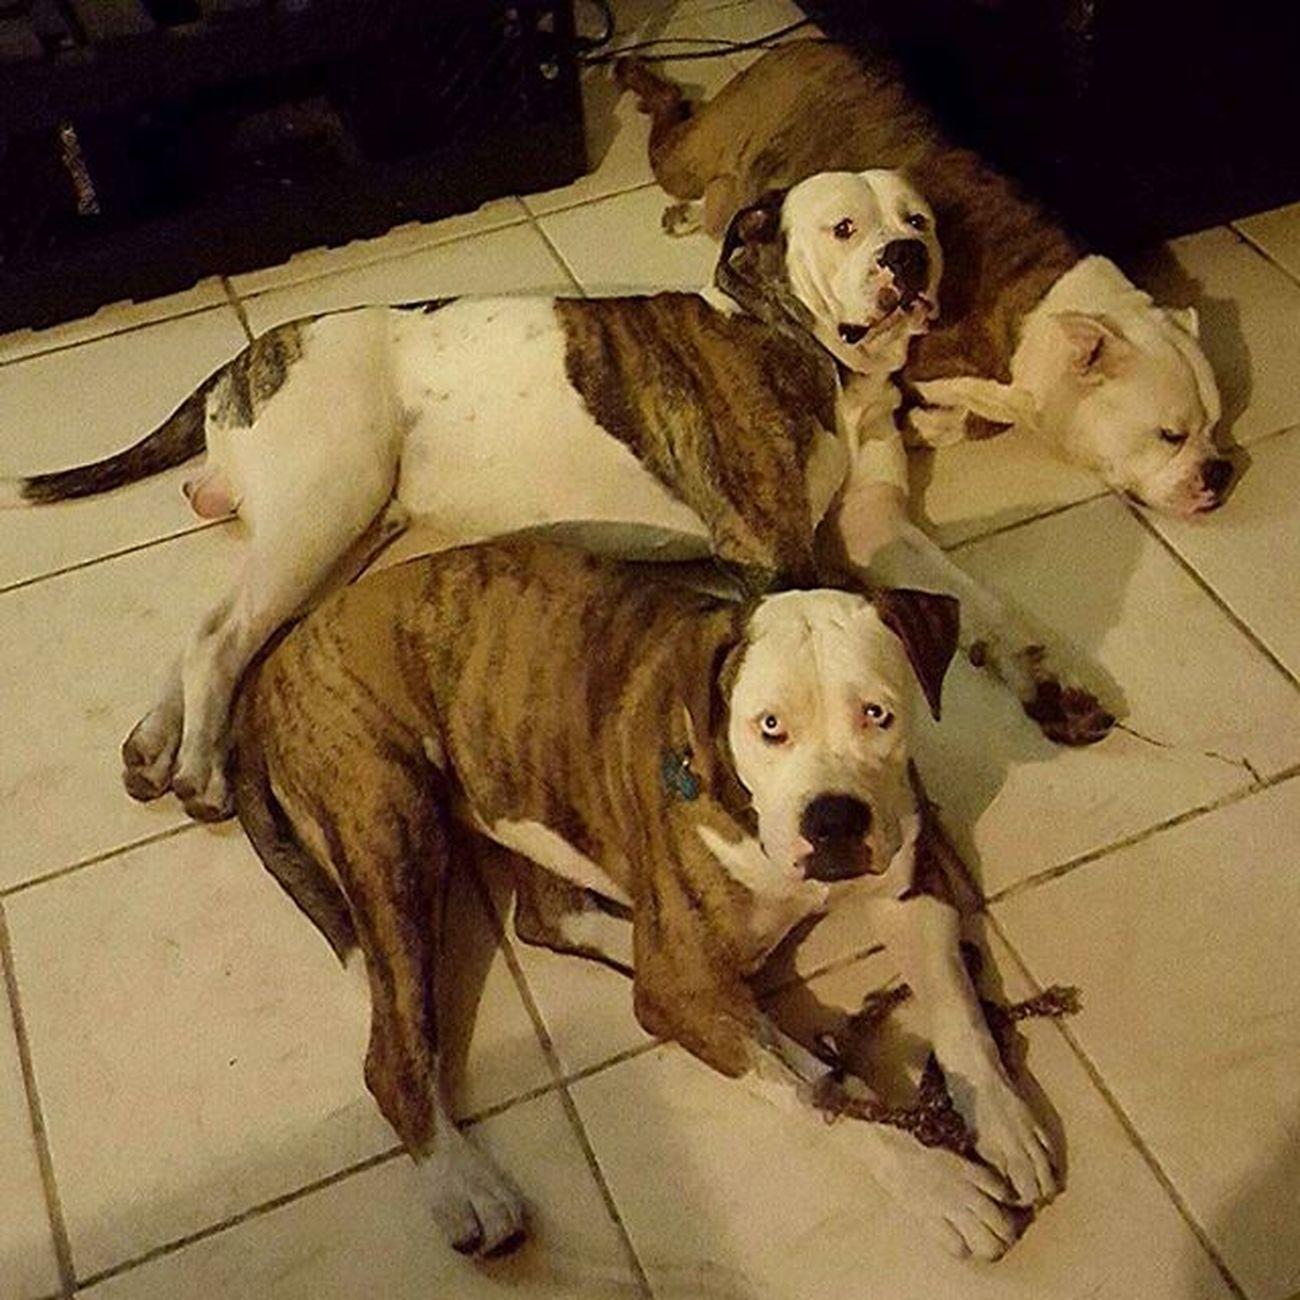 Americanbulldogs Bullies Bulliemomma Hybrid Johnsonbreedamericanbulldog Mom Dad Puppy Bullielove Bullielife Katie Jax Thor